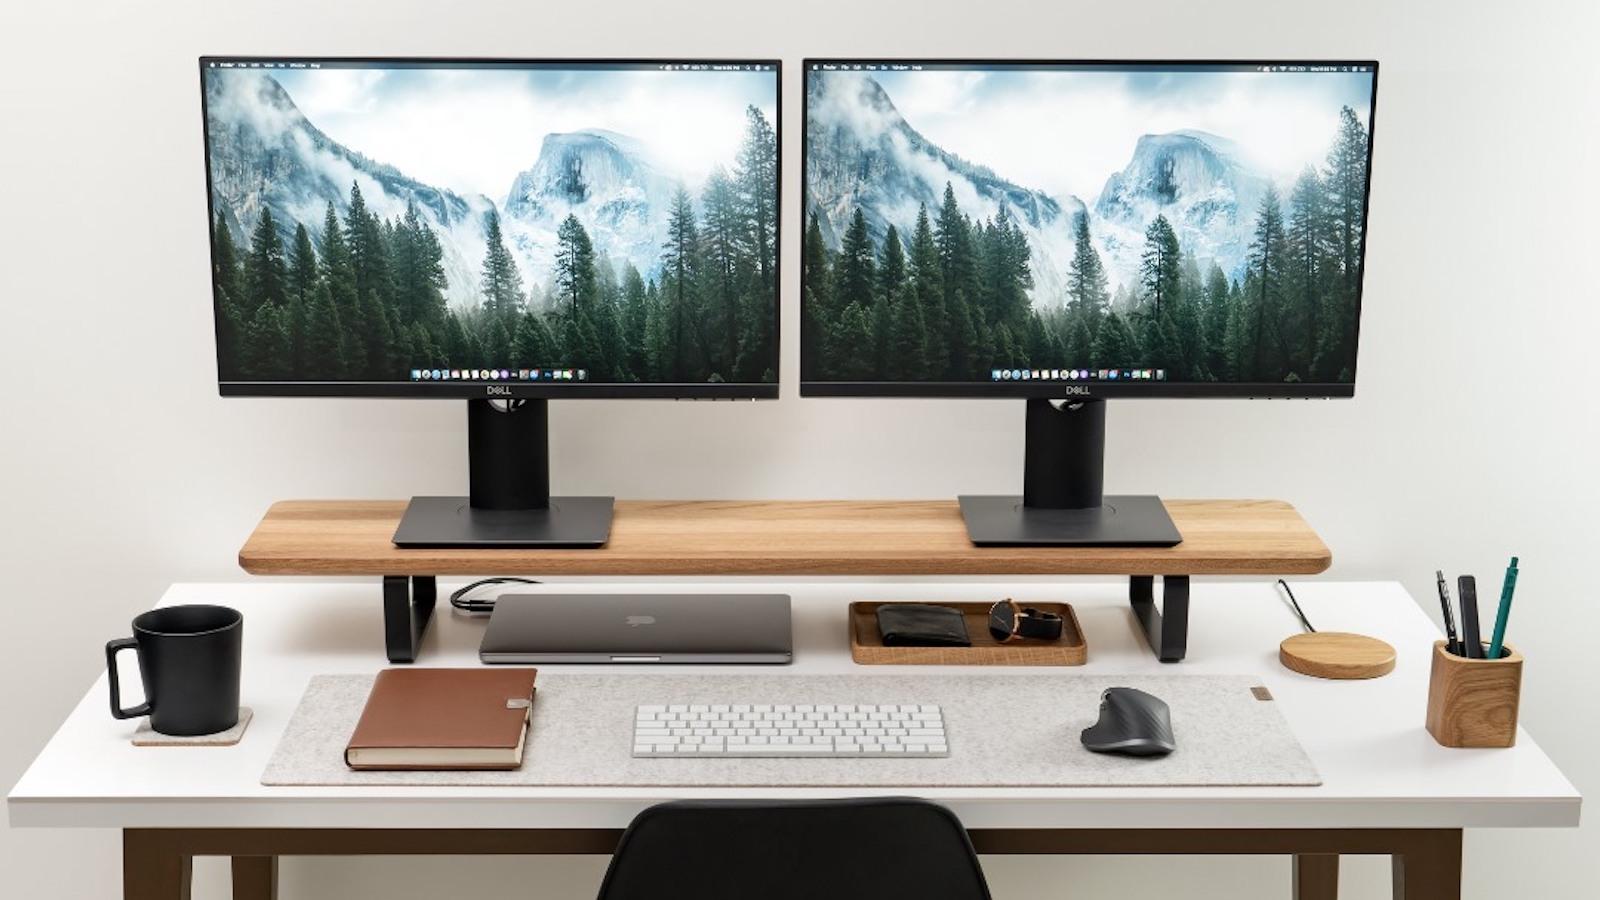 Oakywood-Desk-Shelf-dual-monitor-stand-001.jpg